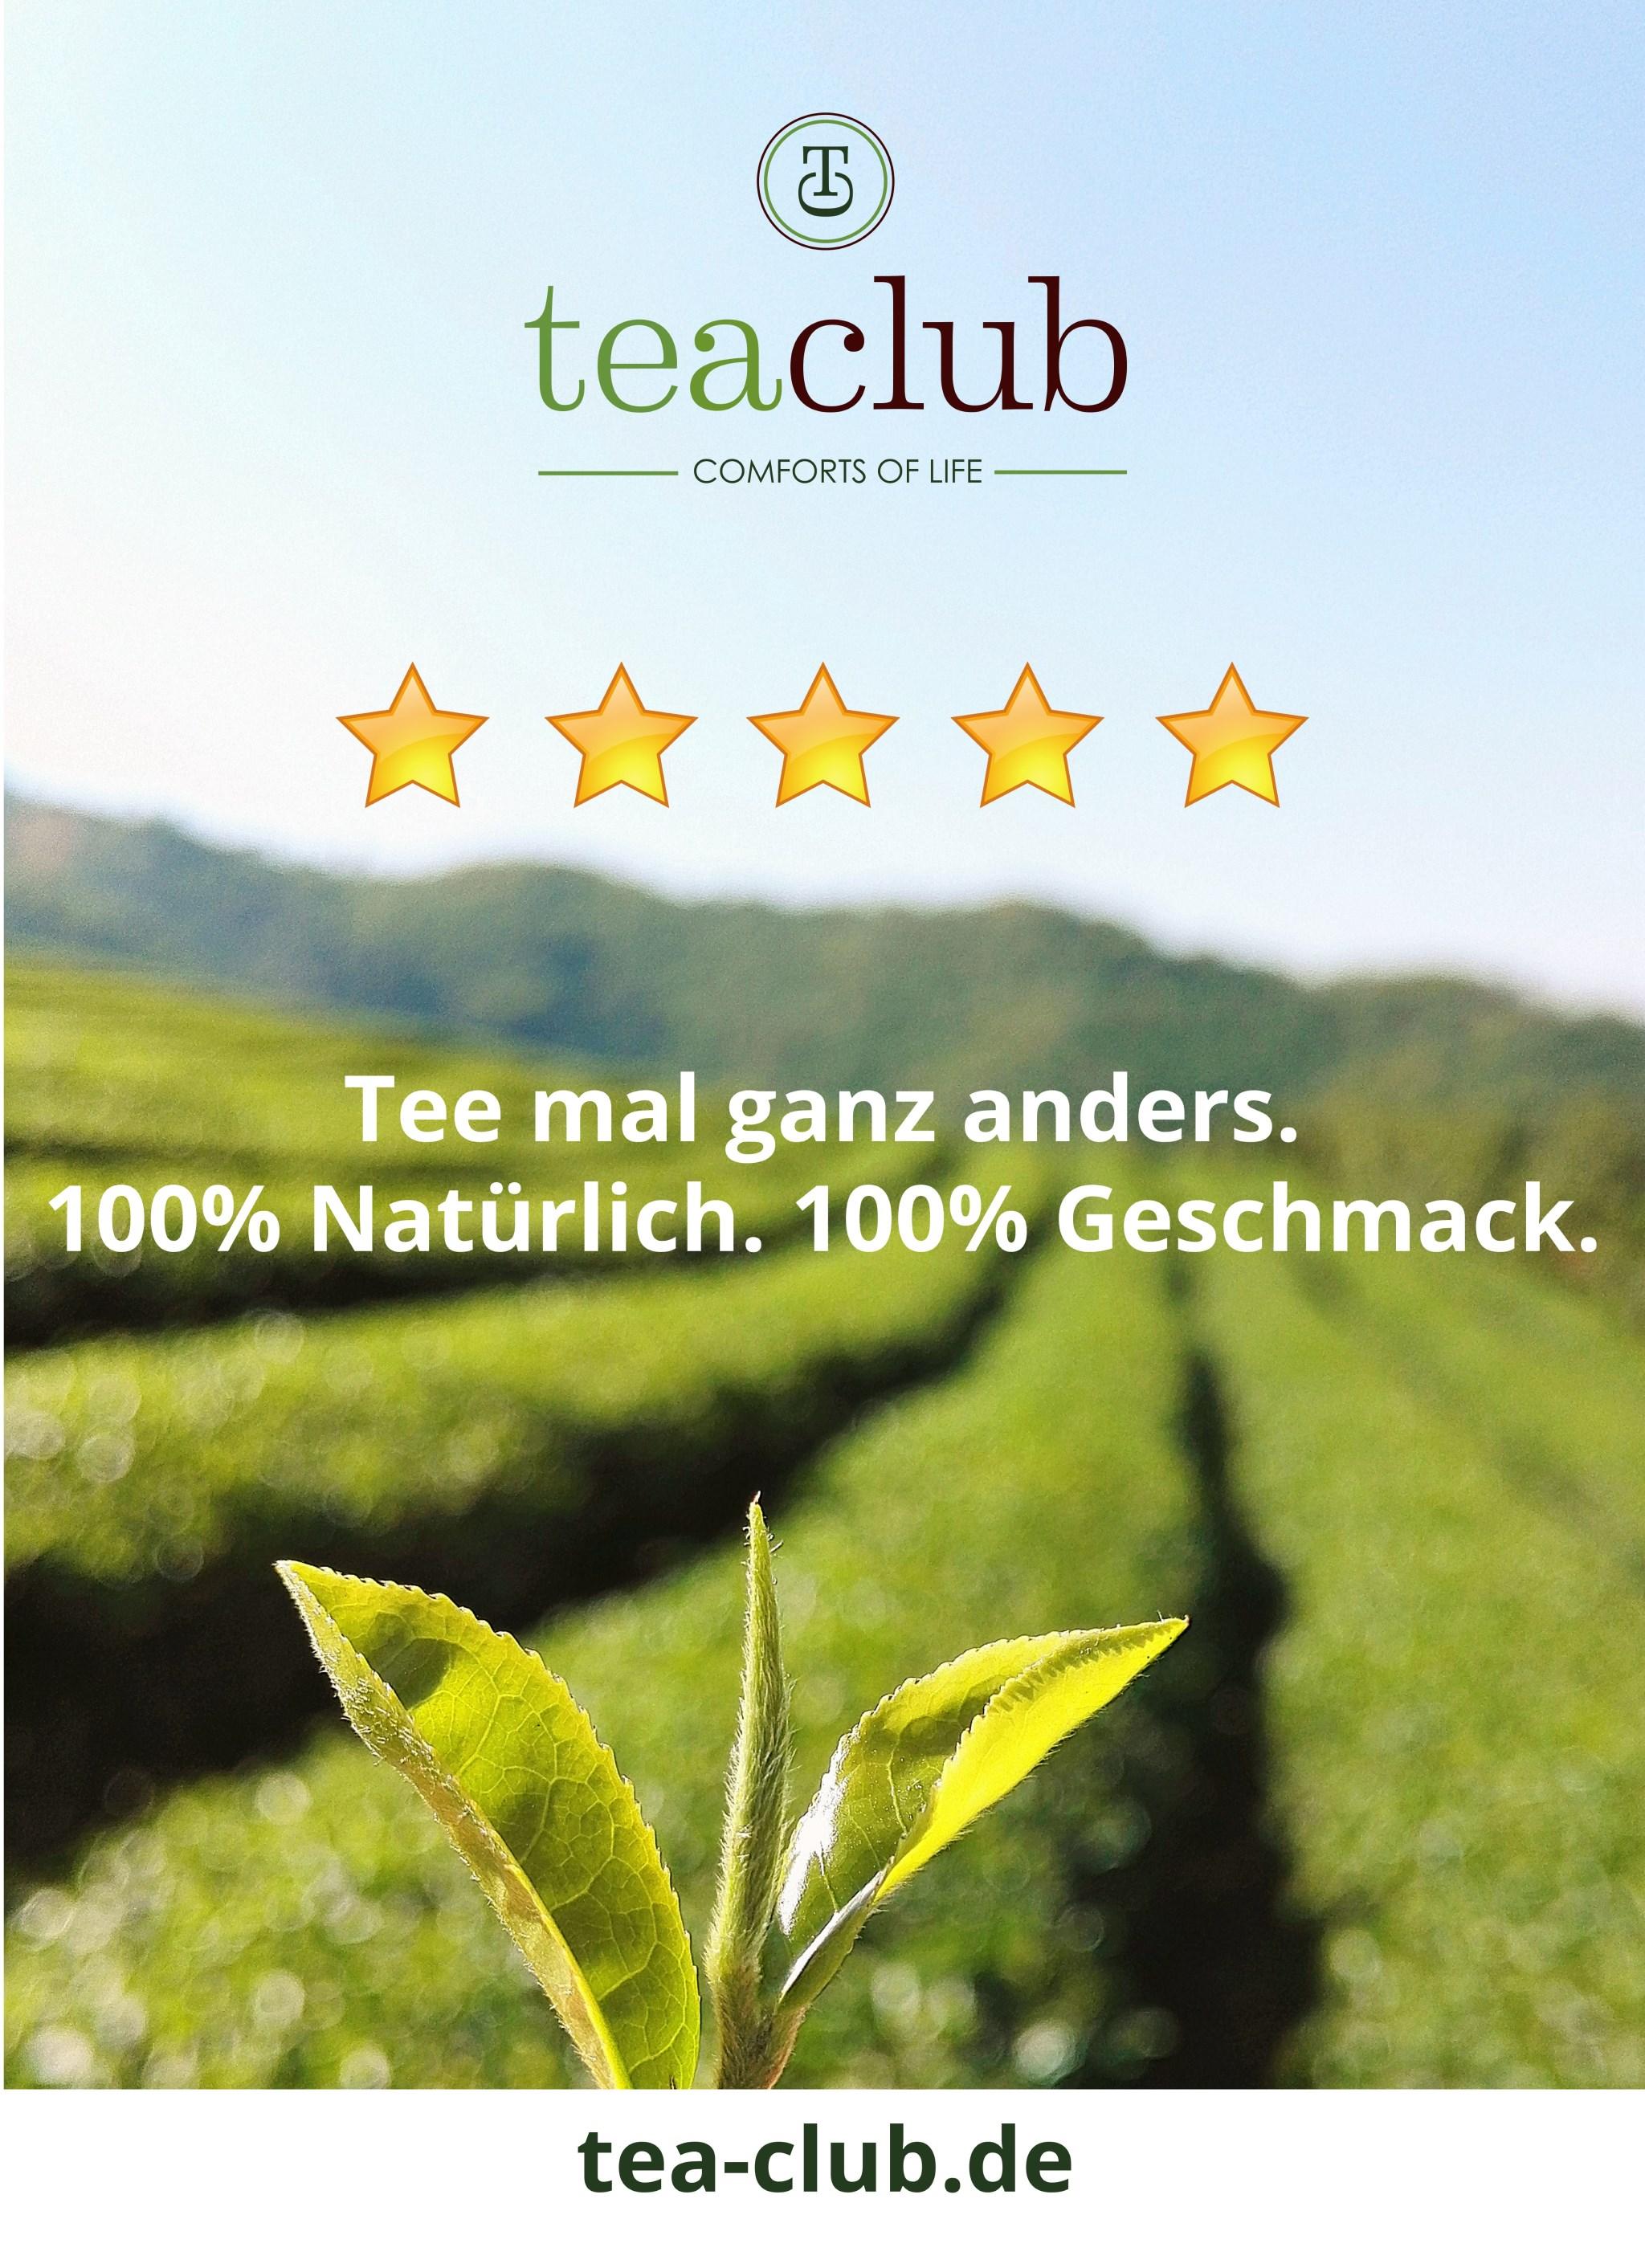 teaclub_1_100_natuerlich